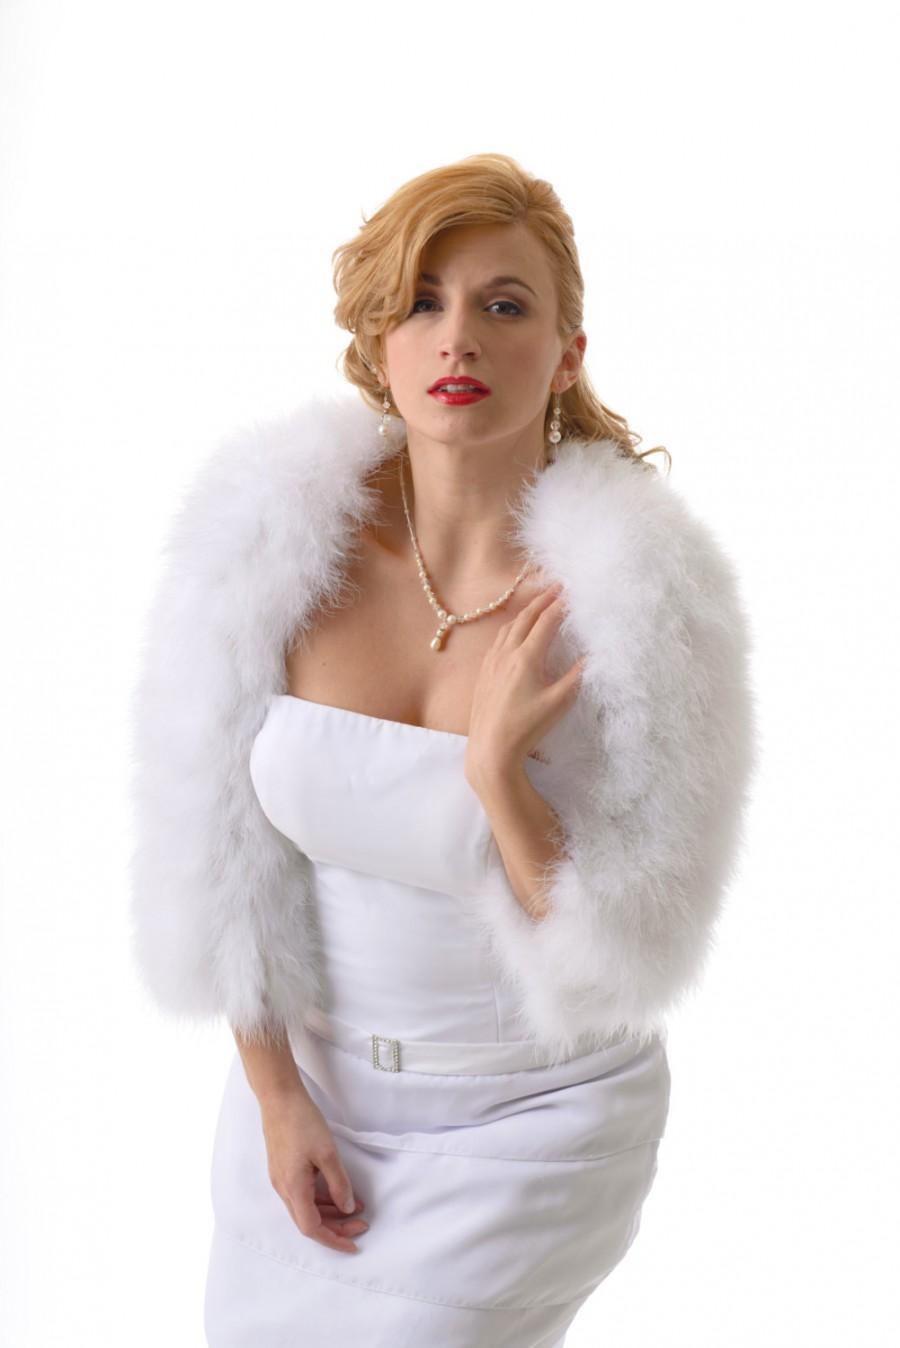 Свадьба - SALE 50% OFF: White Bridal Marabou Shrug /Size XS